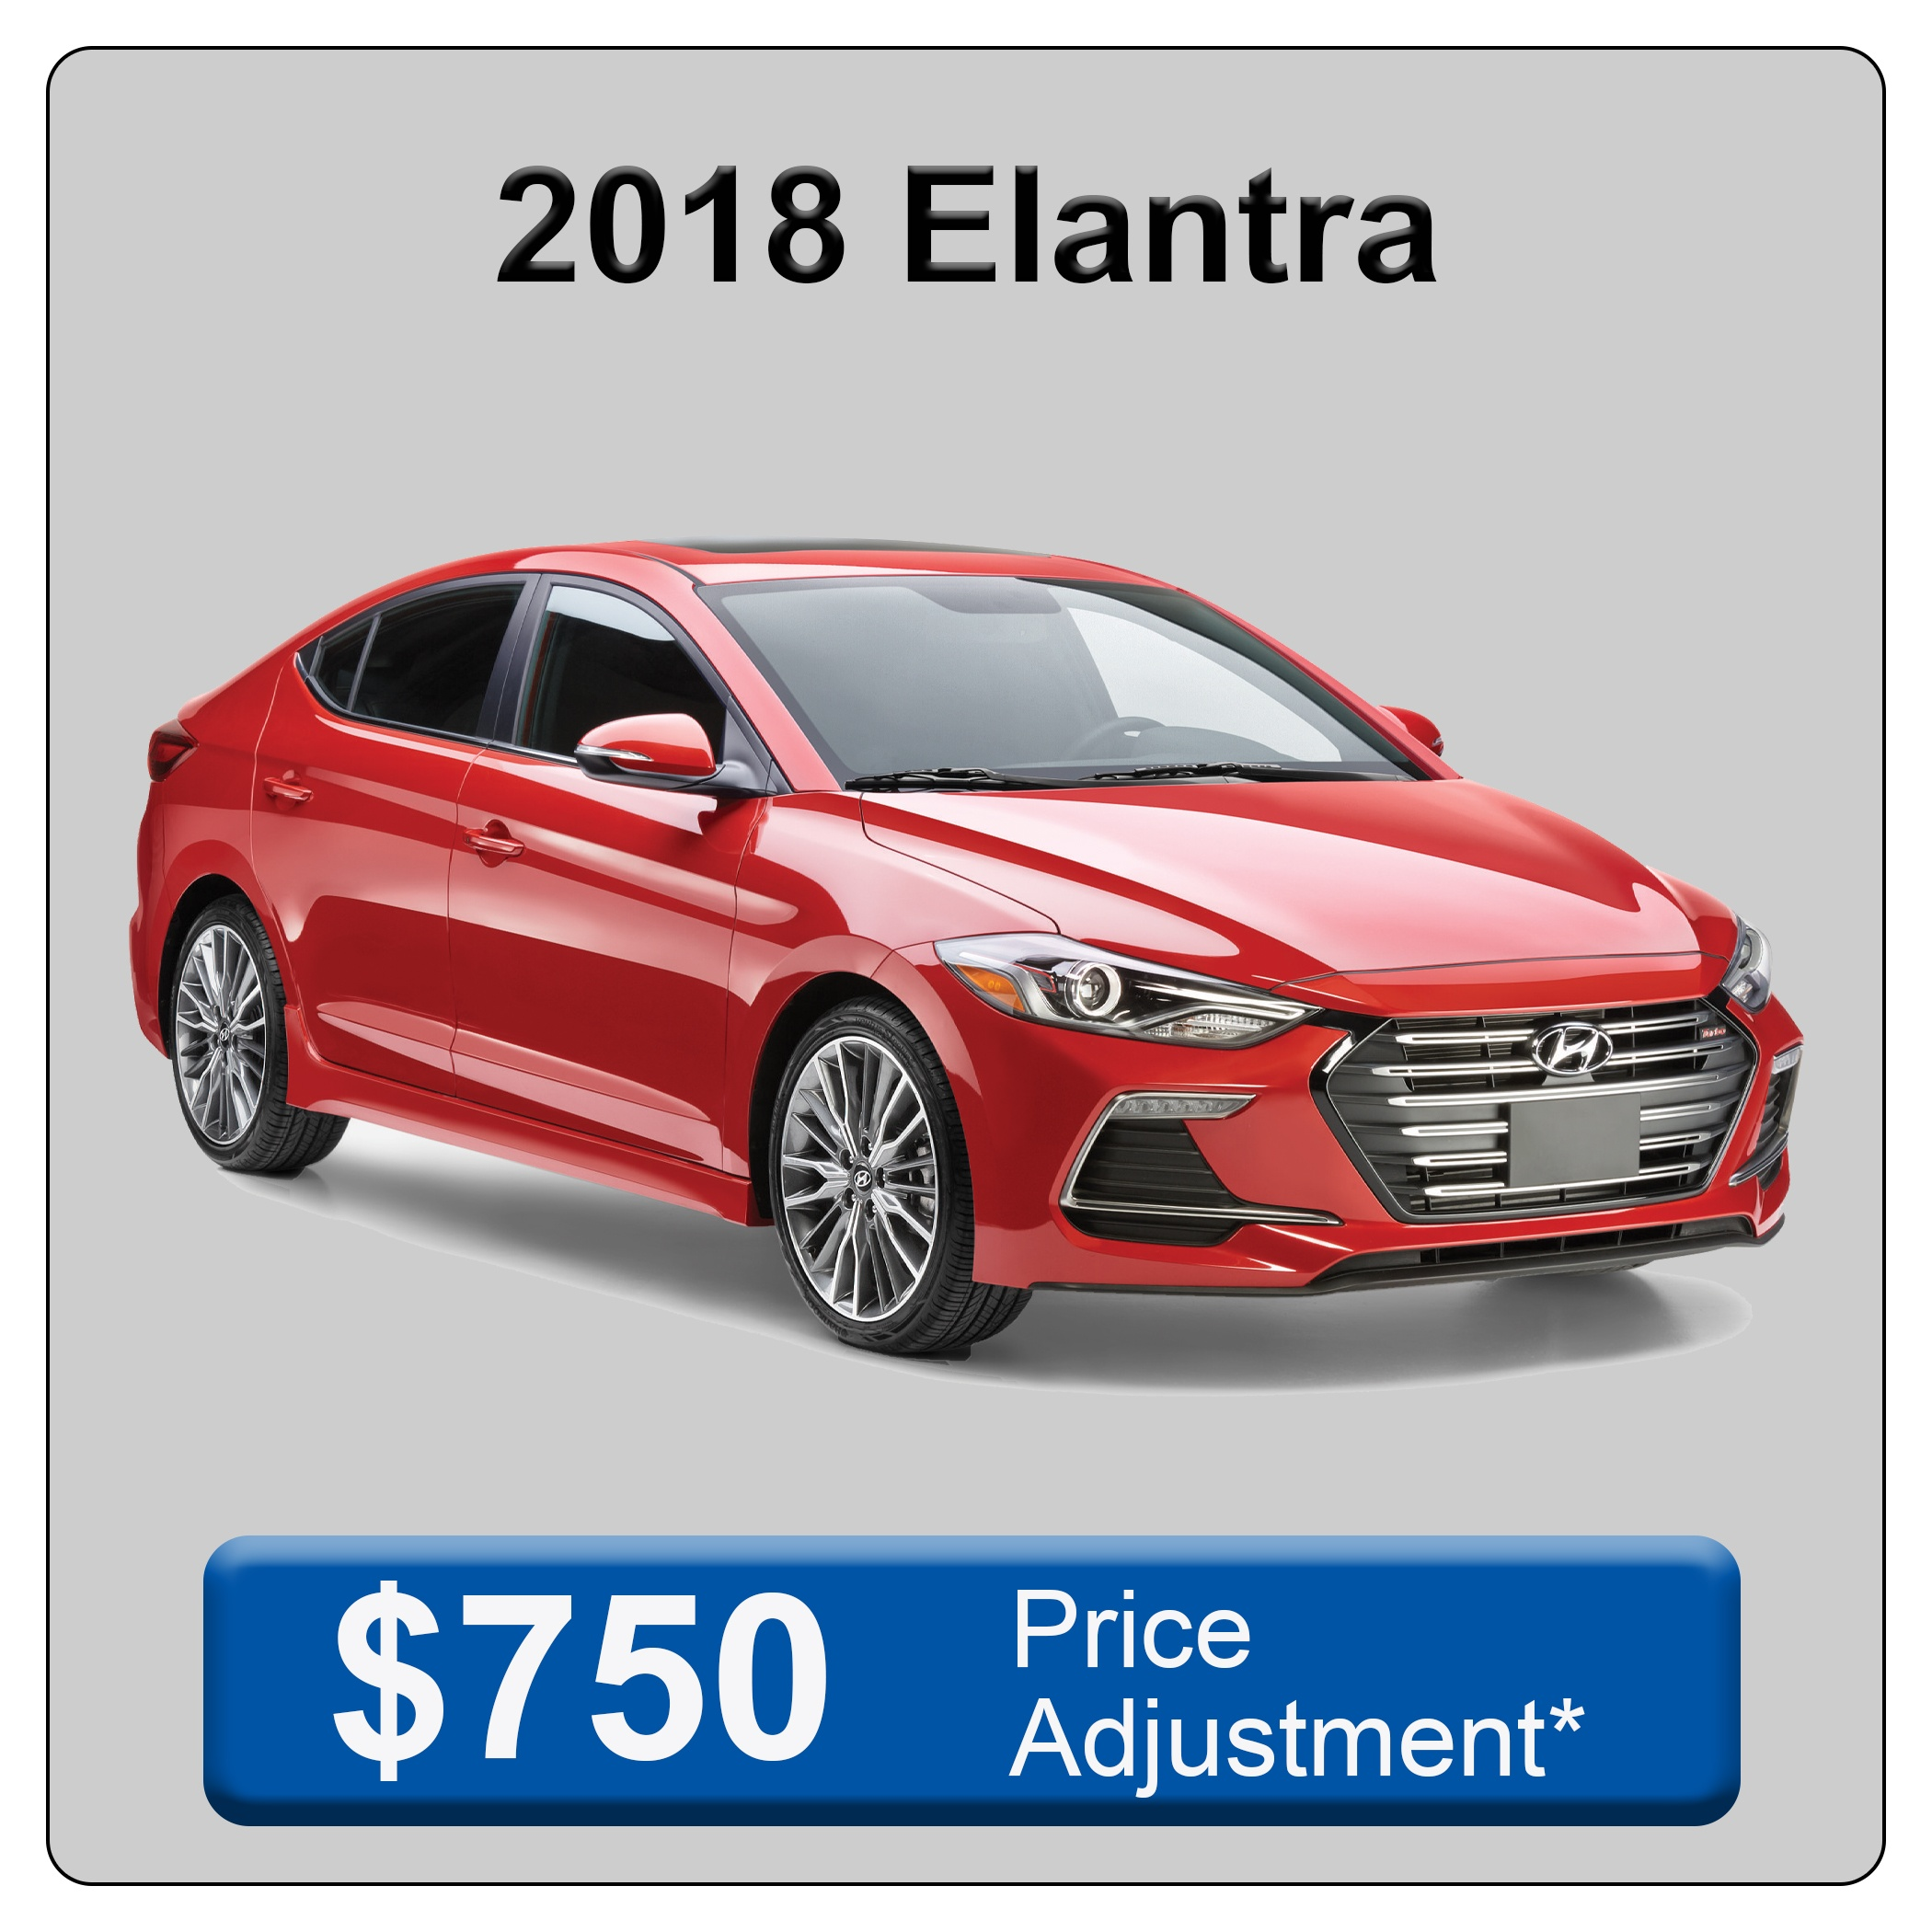 2018 Elantra